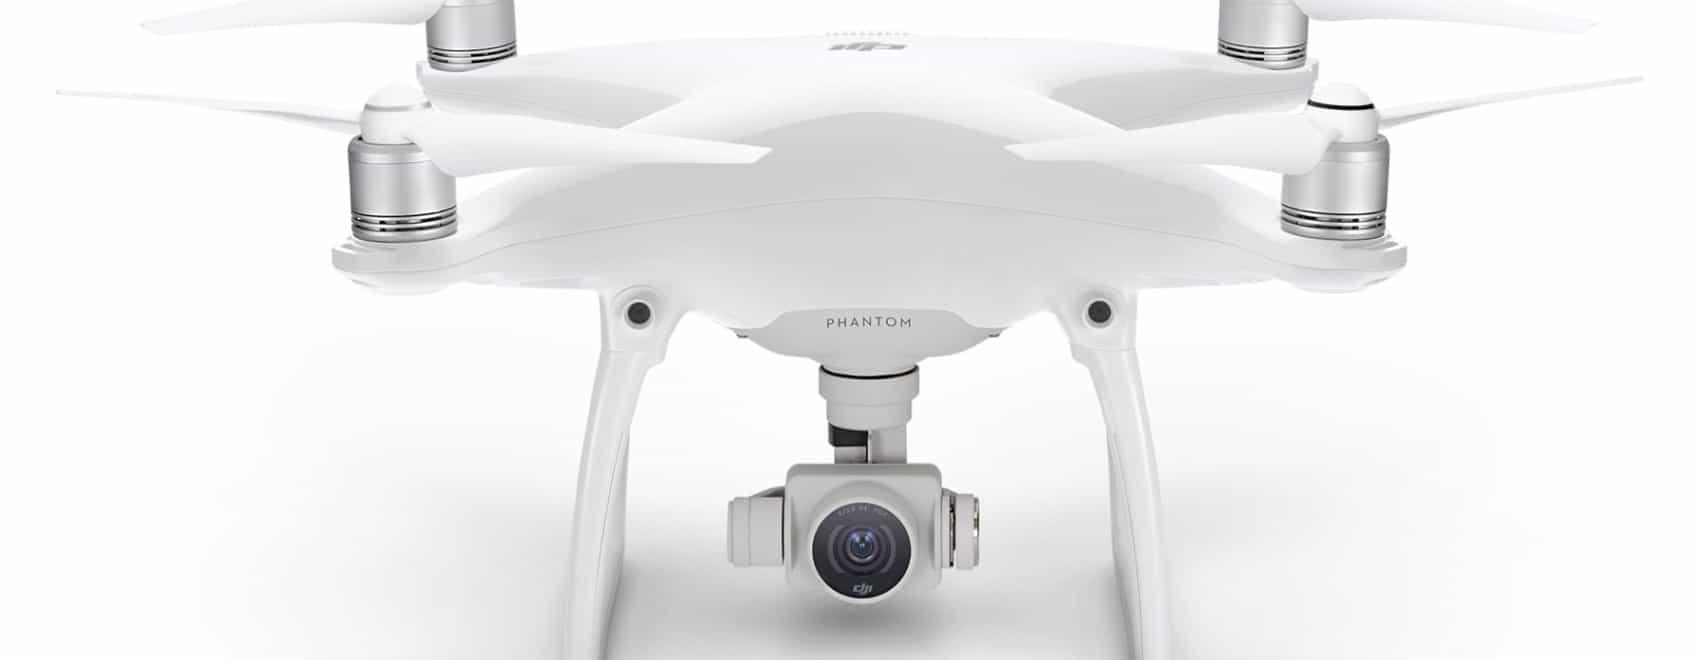 DJI Phantom 4 4 1700x660 - Top 5 Best Professional Drone Reviews